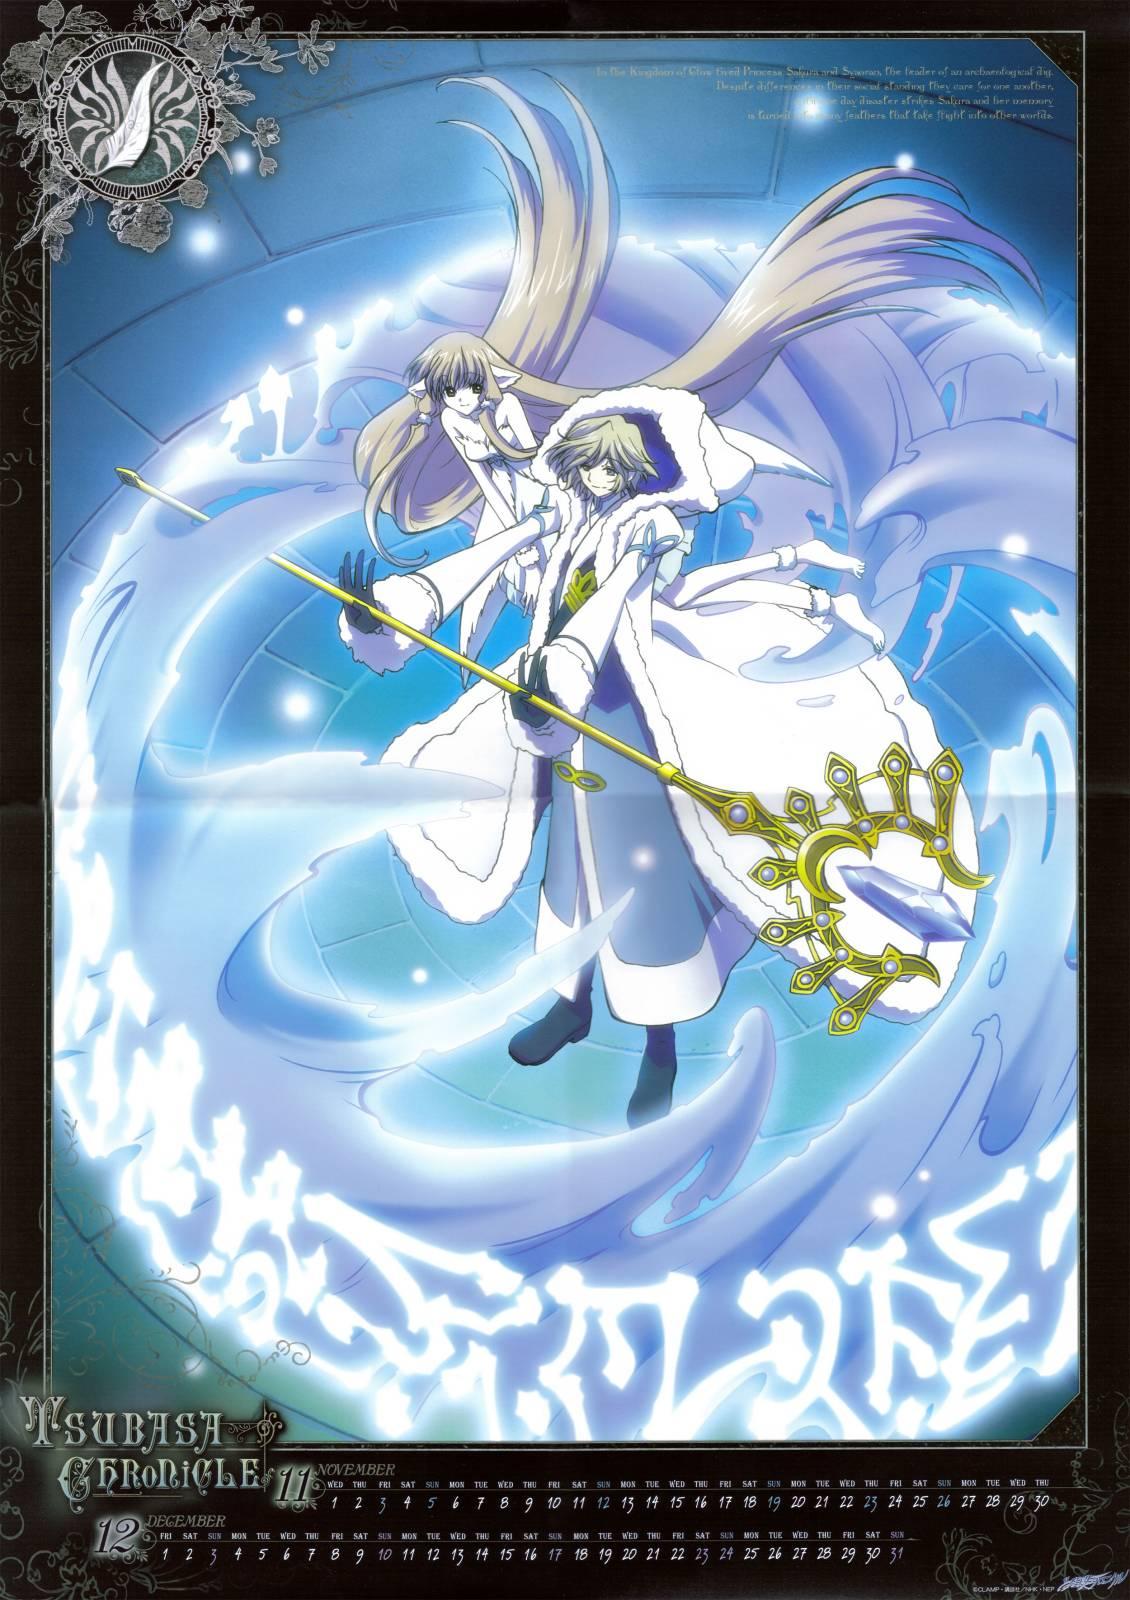 Art Calendar : Tsubasa reservoir chronicle clamp mobile wallpaper